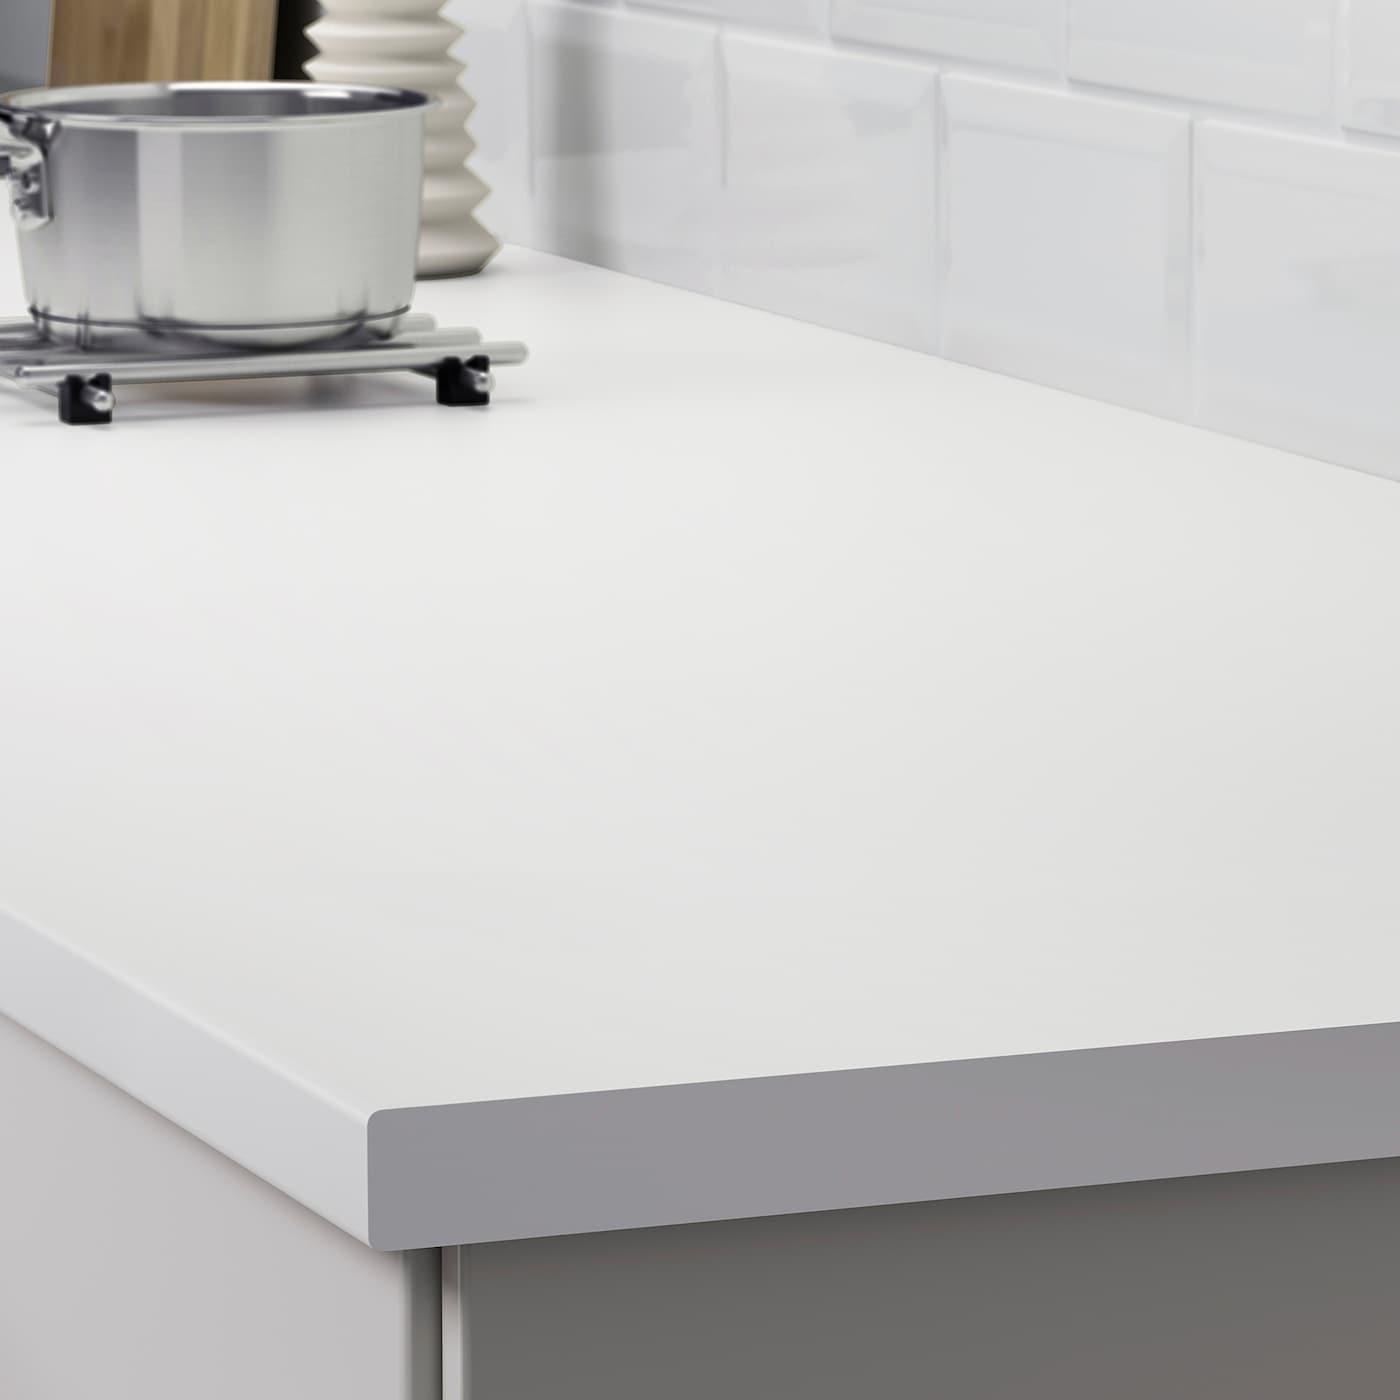 Countertop White Laminate 98x1